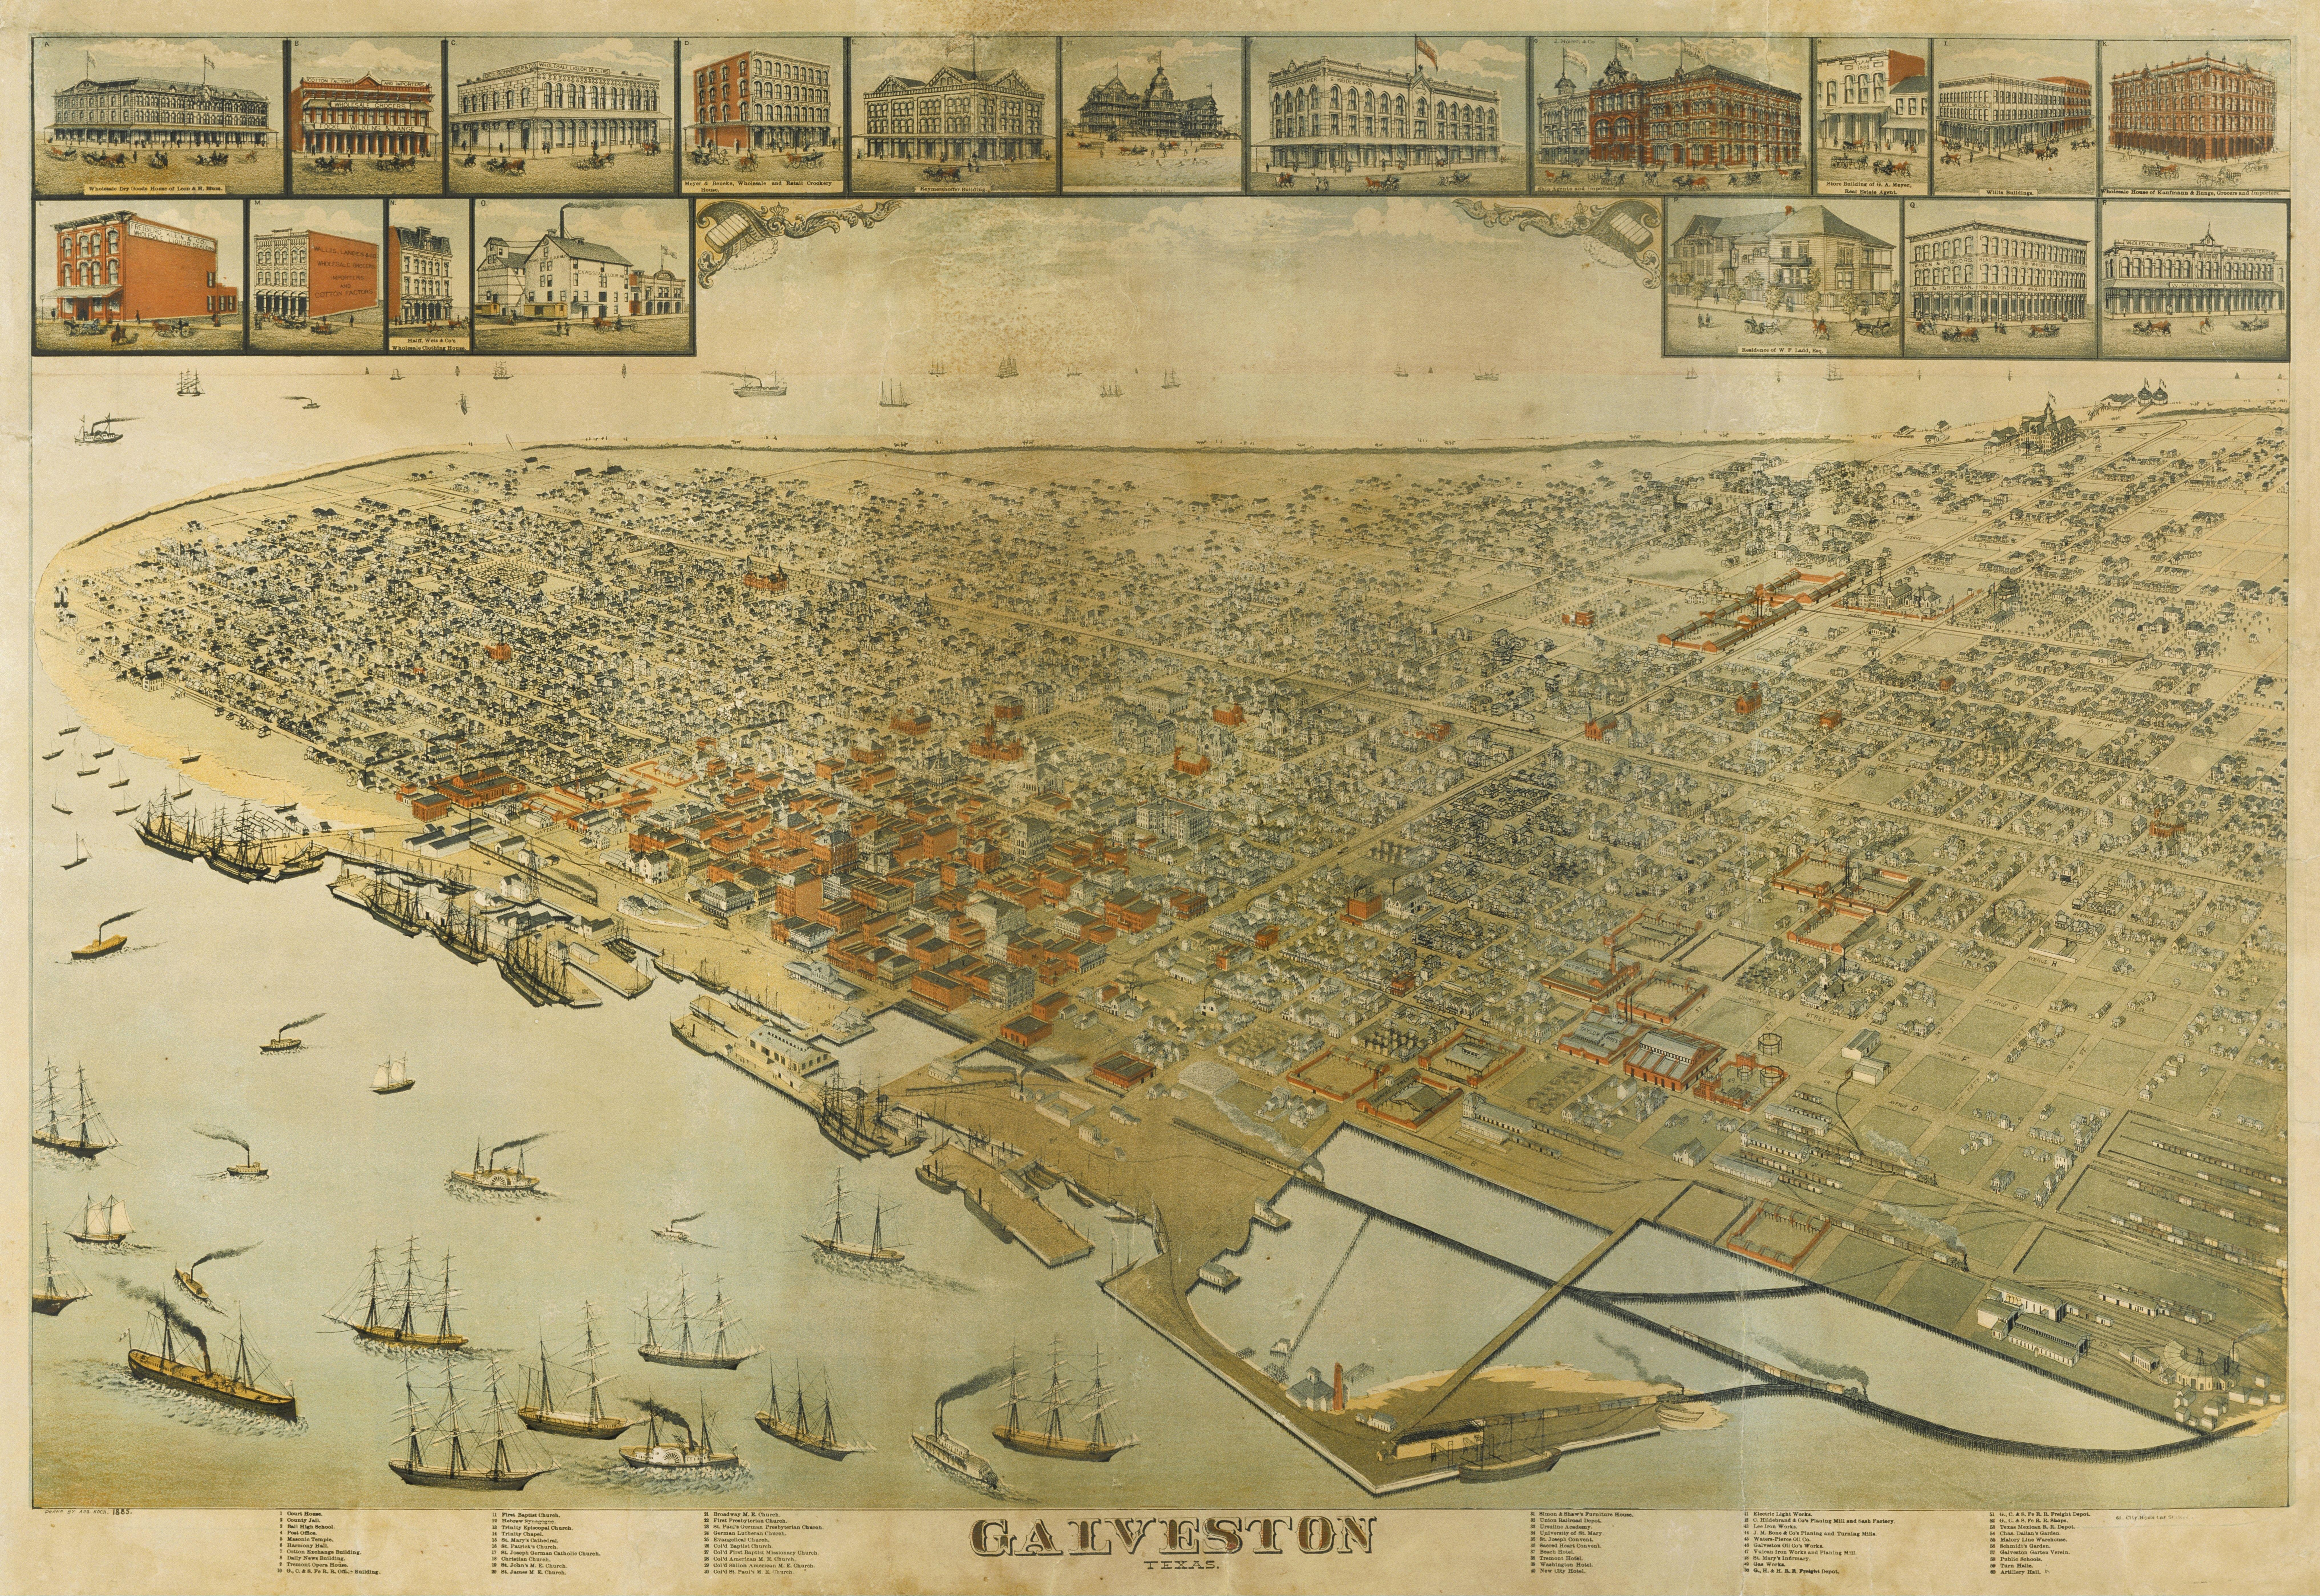 File:Old map-Galveston-1885.jpg - Wikimedia Commons on